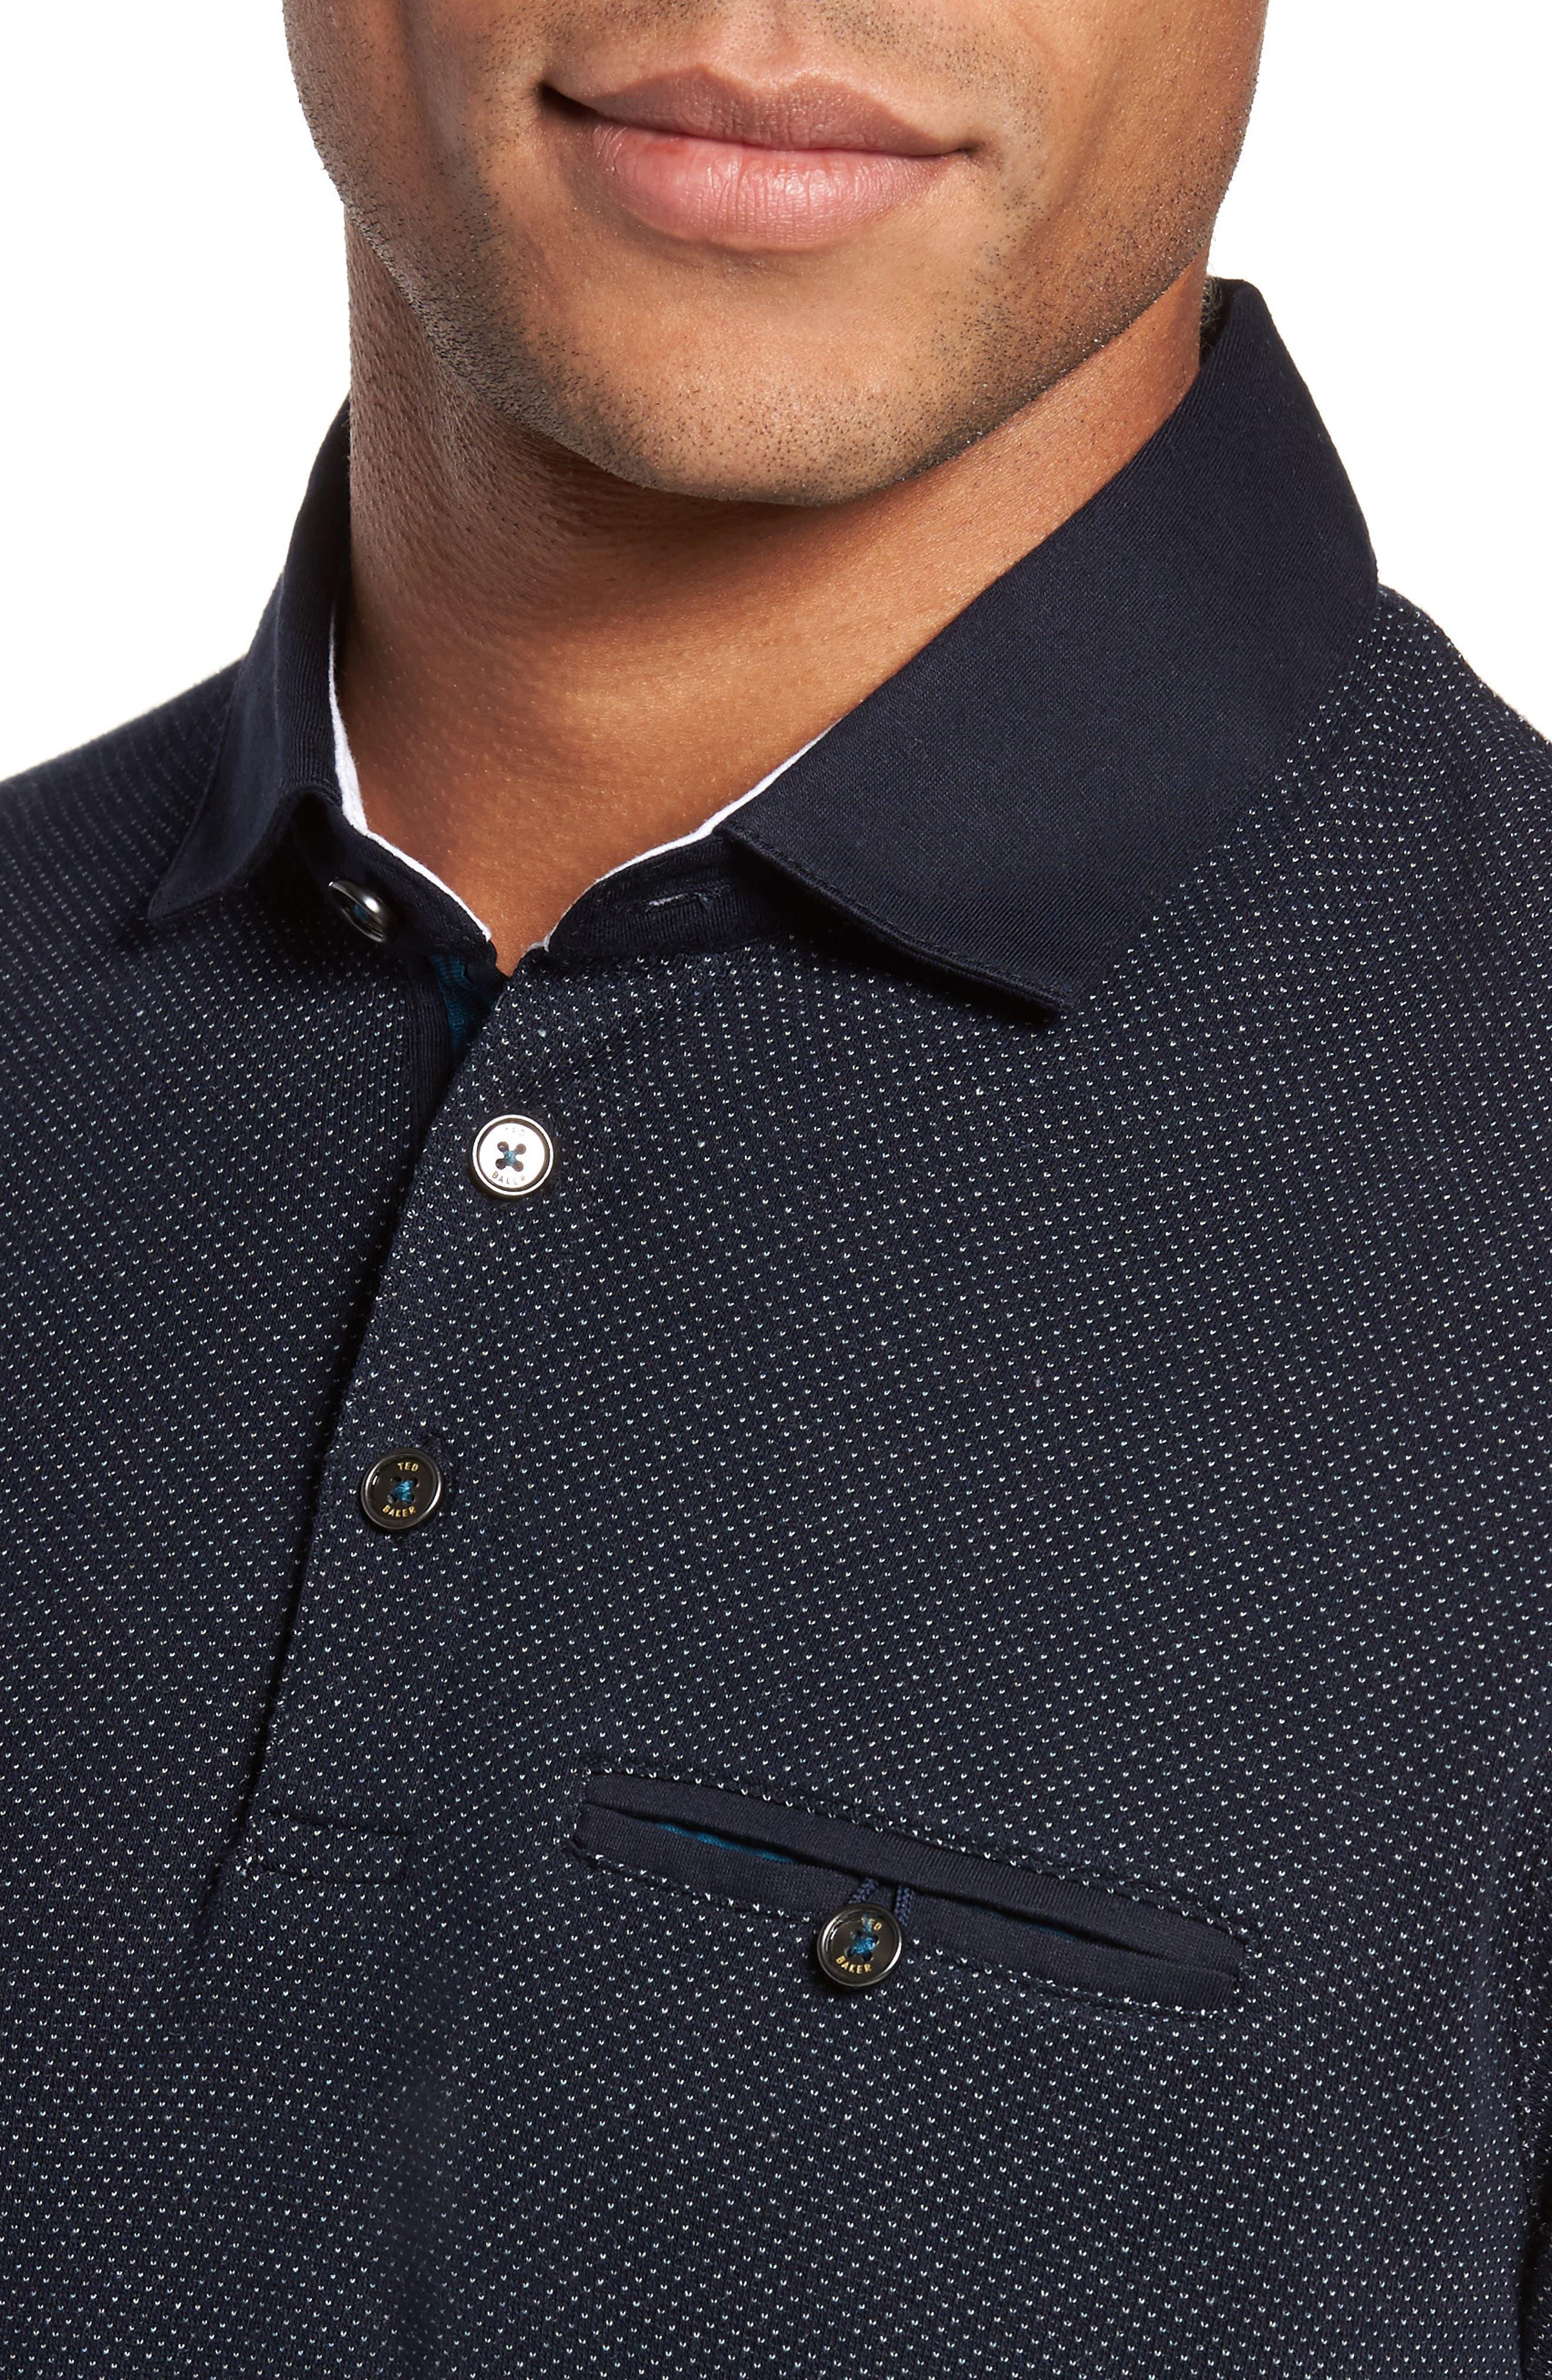 Alburt Modern Slim Fit Polo,                             Alternate thumbnail 4, color,                             410